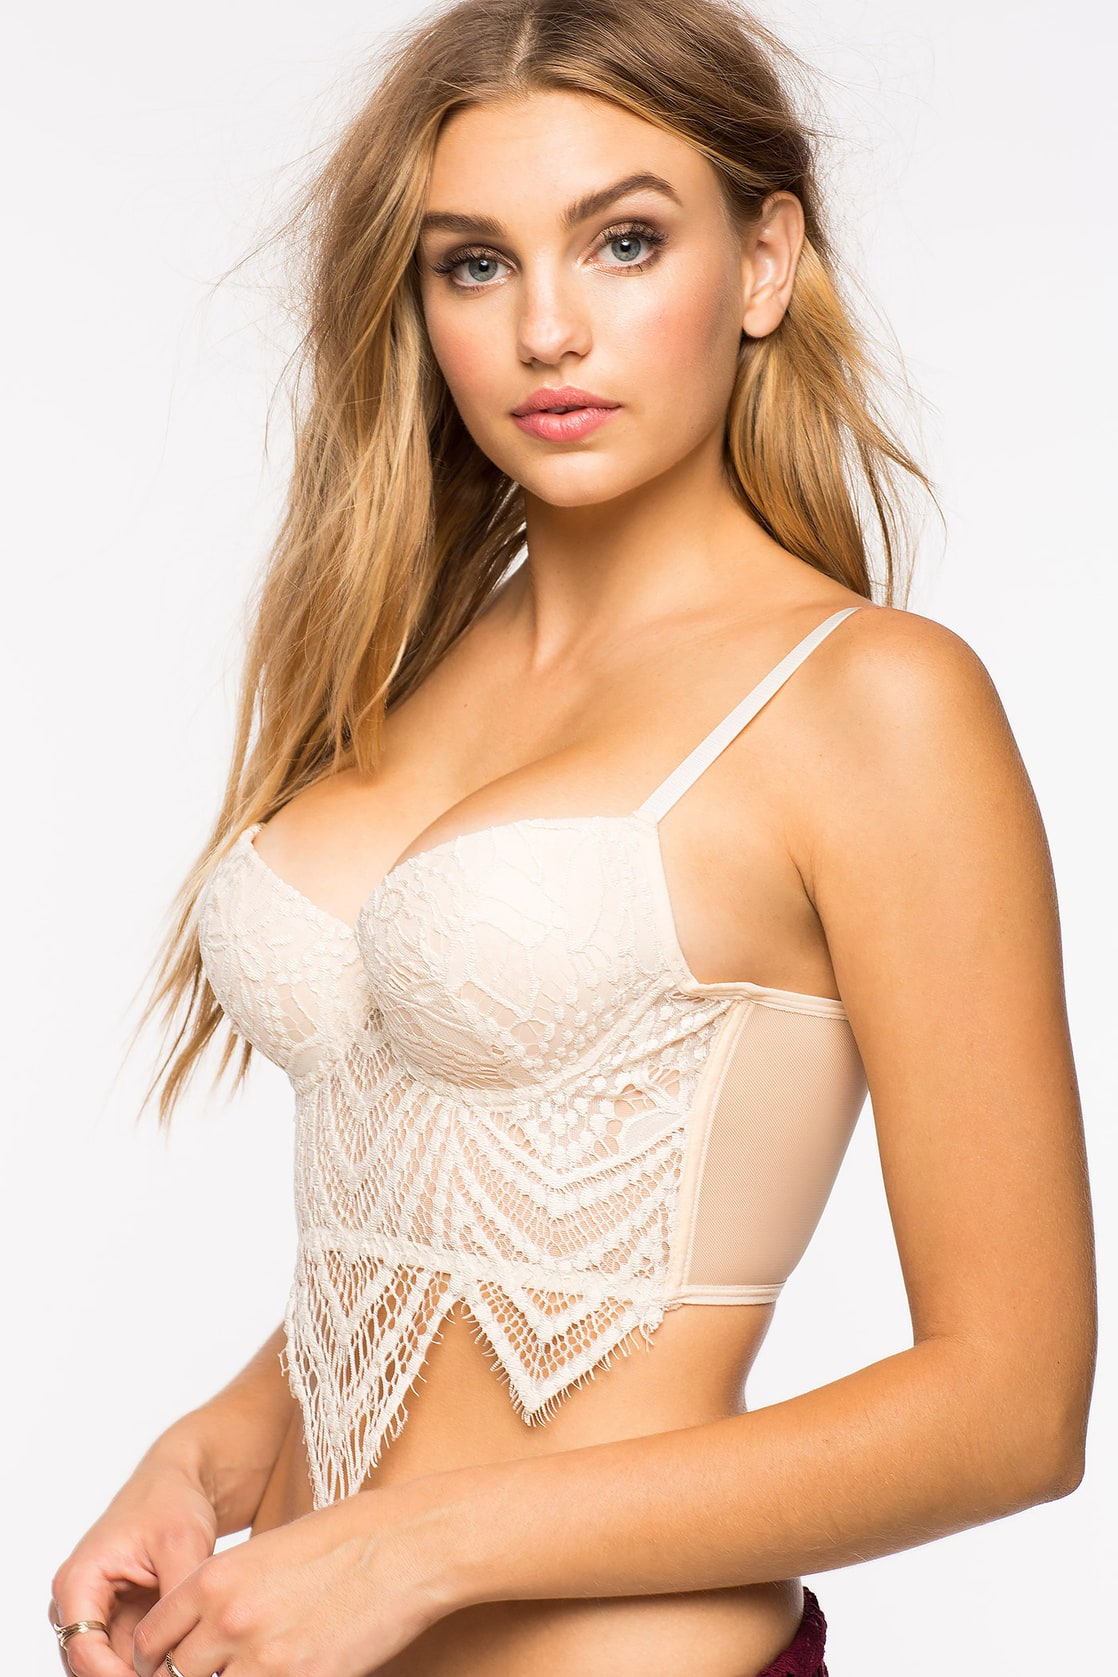 Erotica Olivia Brower nude photos 2019